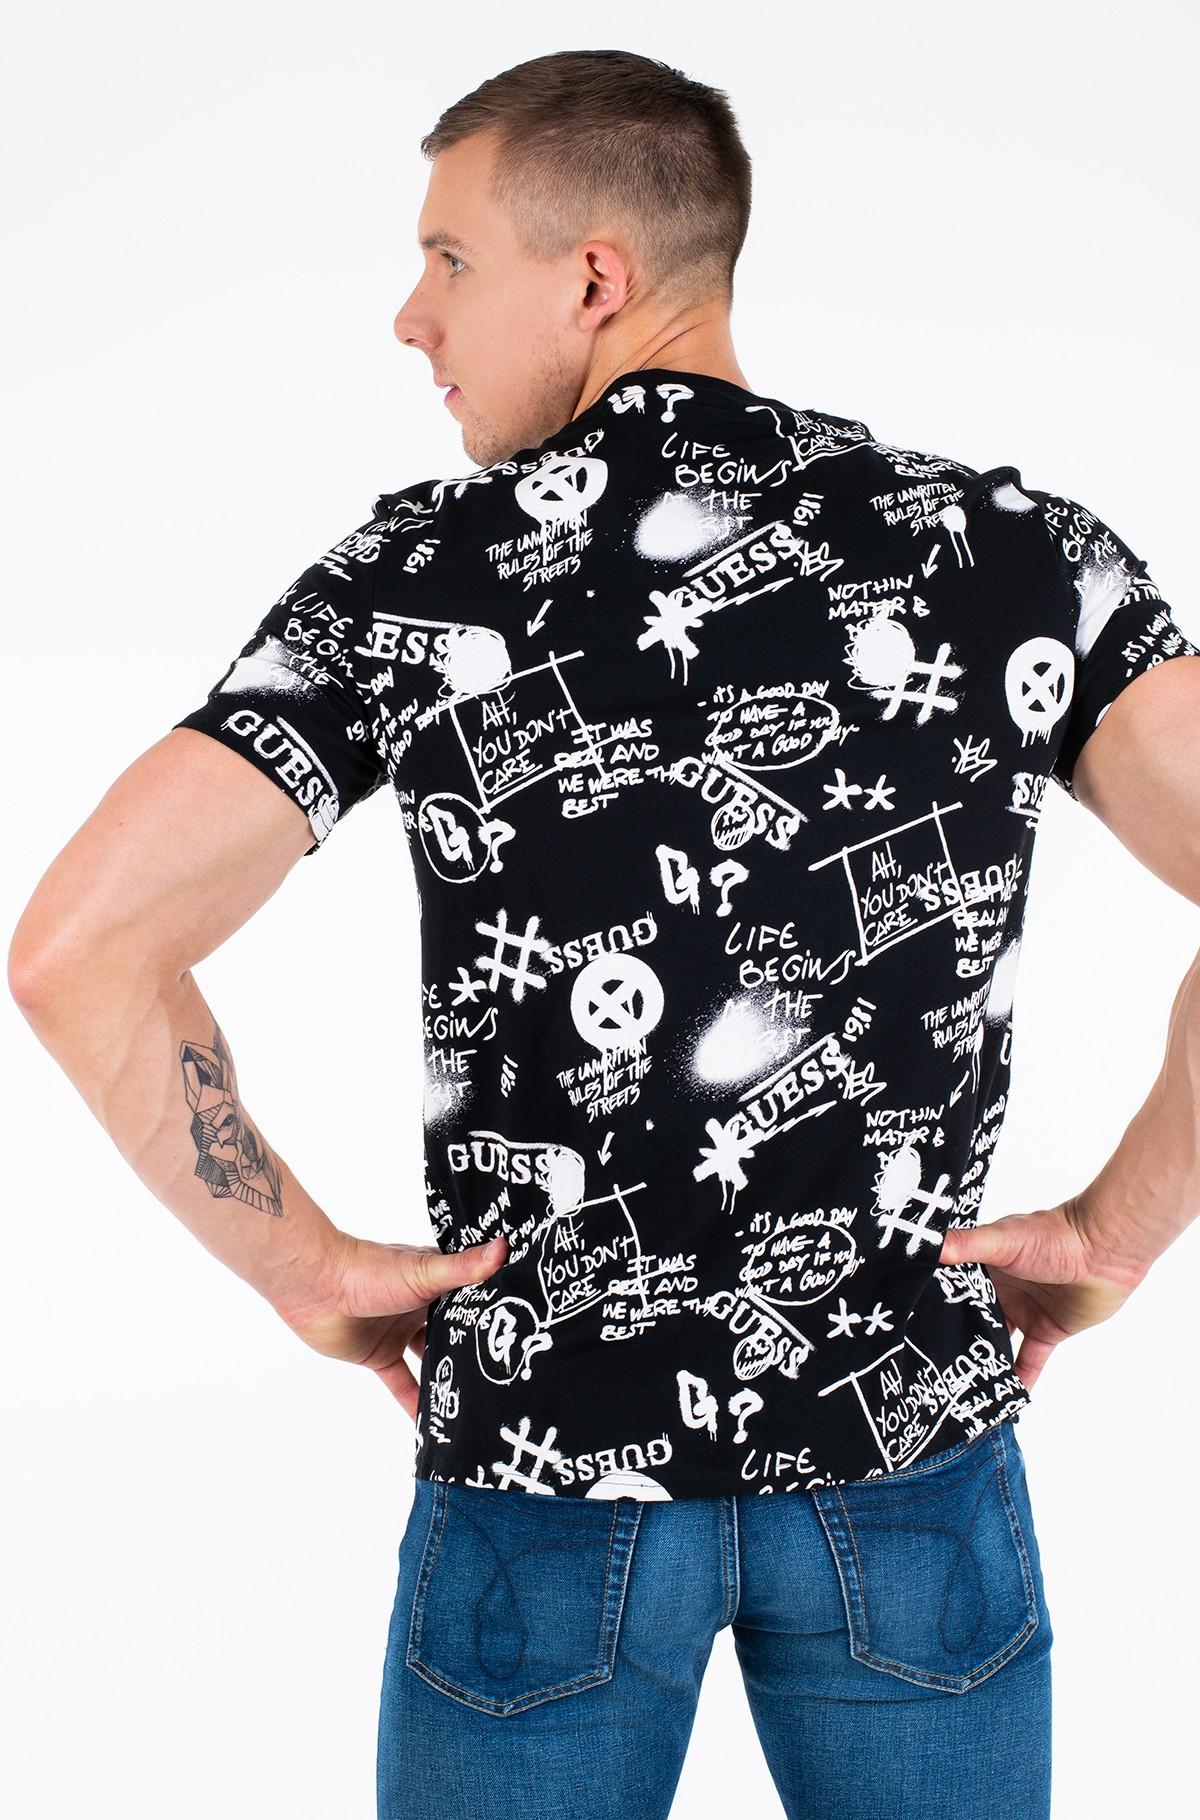 T-SHIRT LOGO ALL OVER COTONE GUESS | T-shirt | M0BI92 I3Z11F9NB